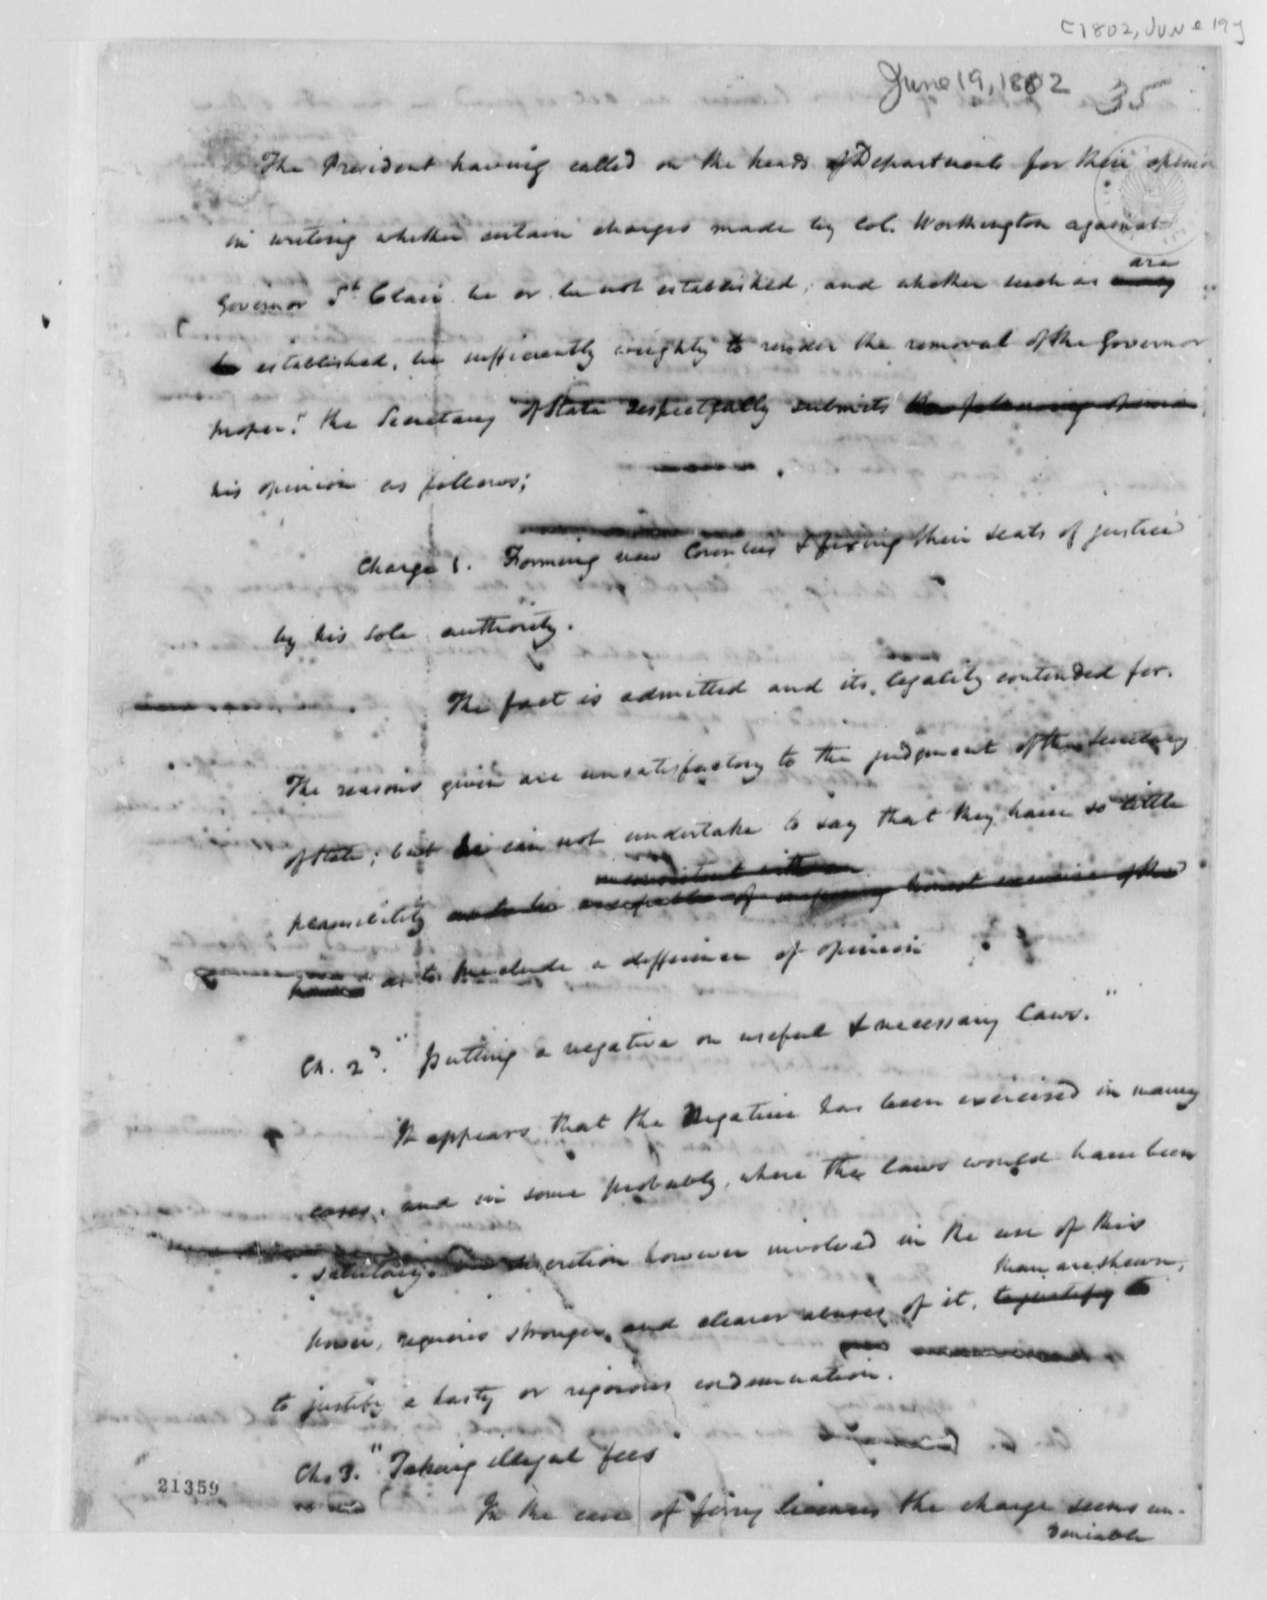 James Madison to Thomas Jefferson, June 19, 1802